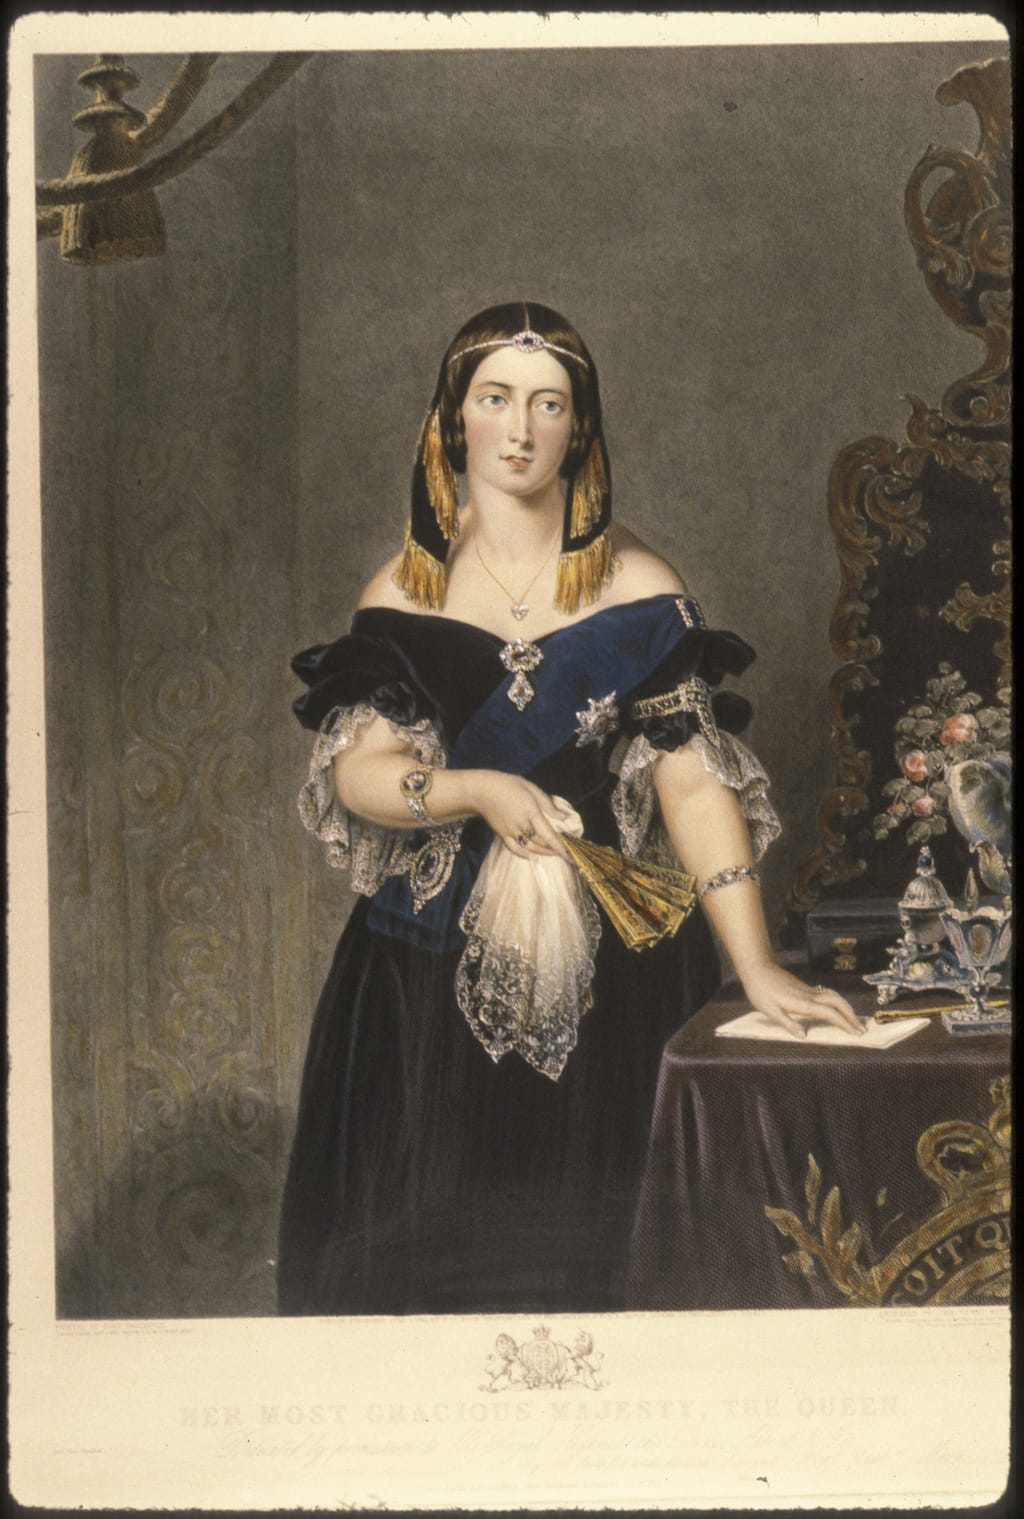 Sa Très Gracieuse Majesté la reine Victoria